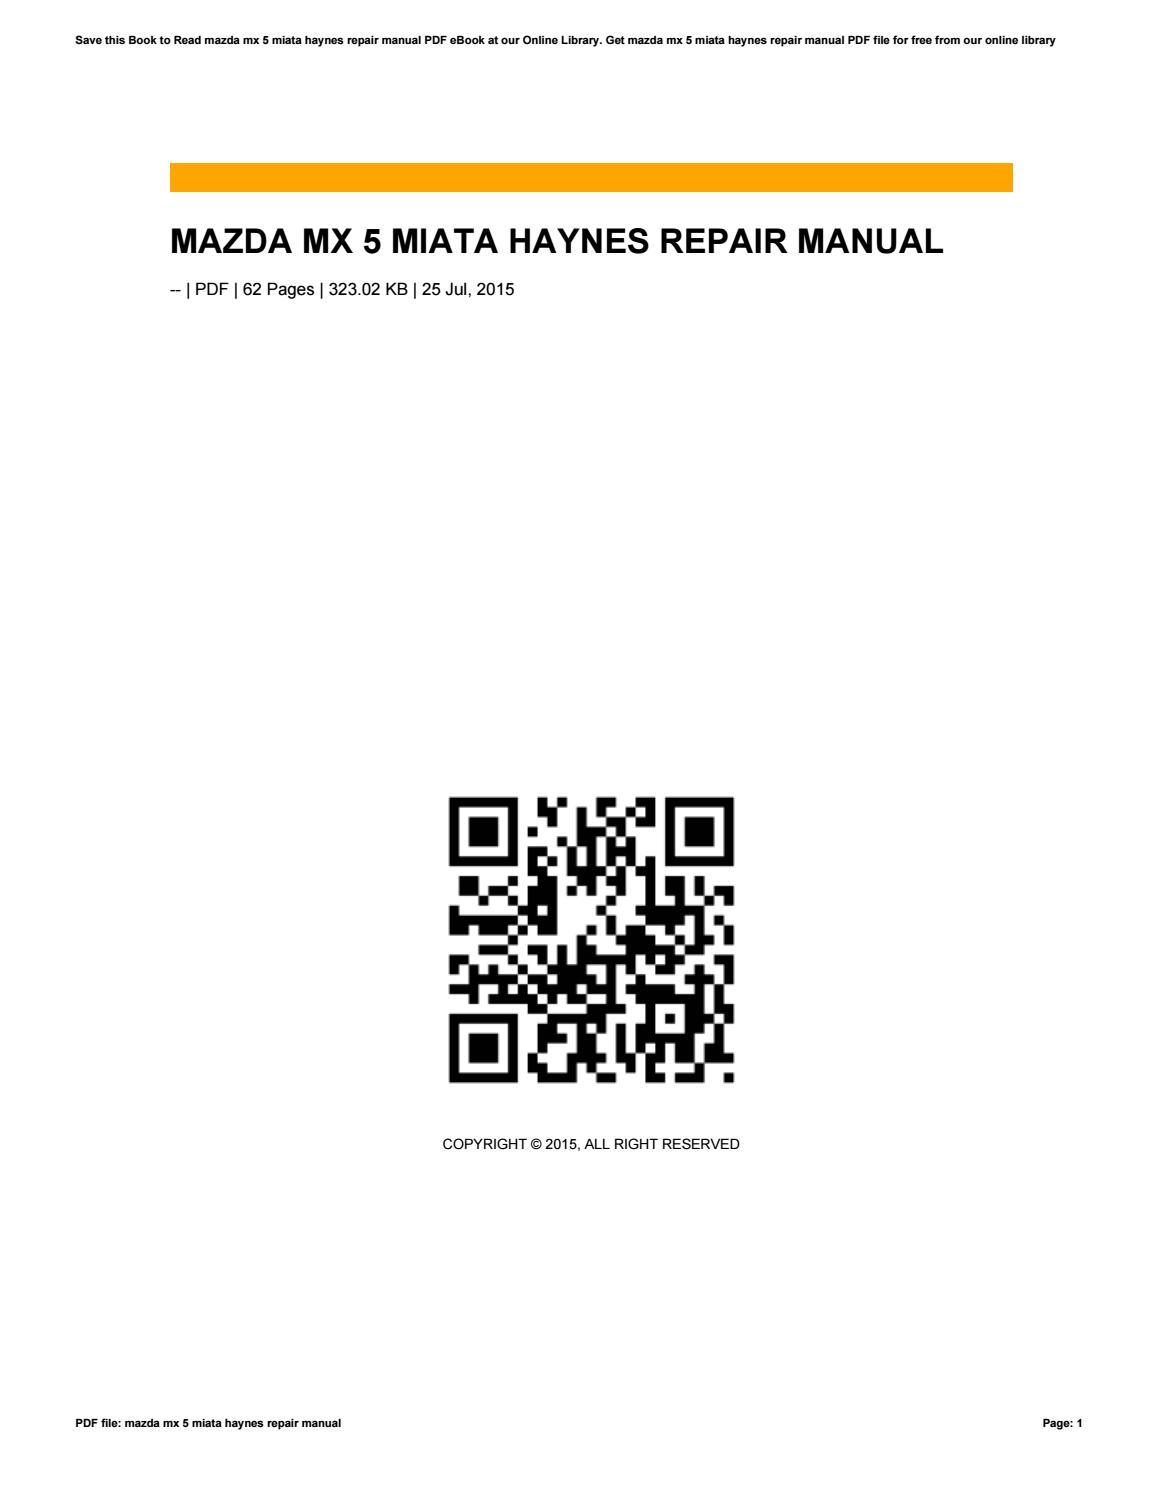 ford escape Array - mazda astina transmission repair manual ebook rh mazda  astina transmission repair manual ebook